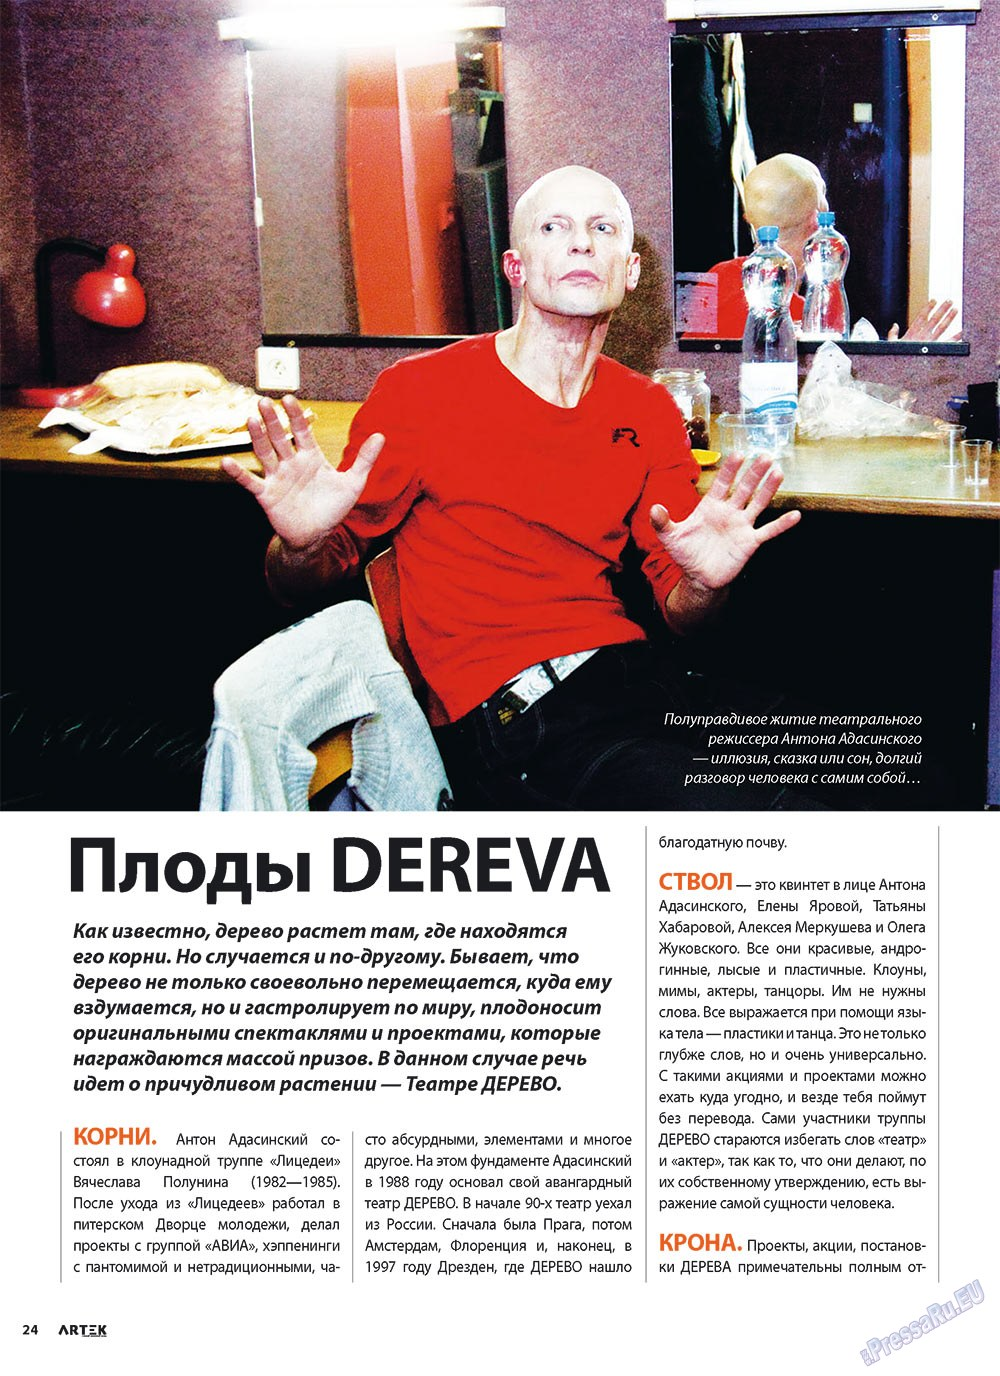 Артек (журнал). 2010 год, номер 2, стр. 26